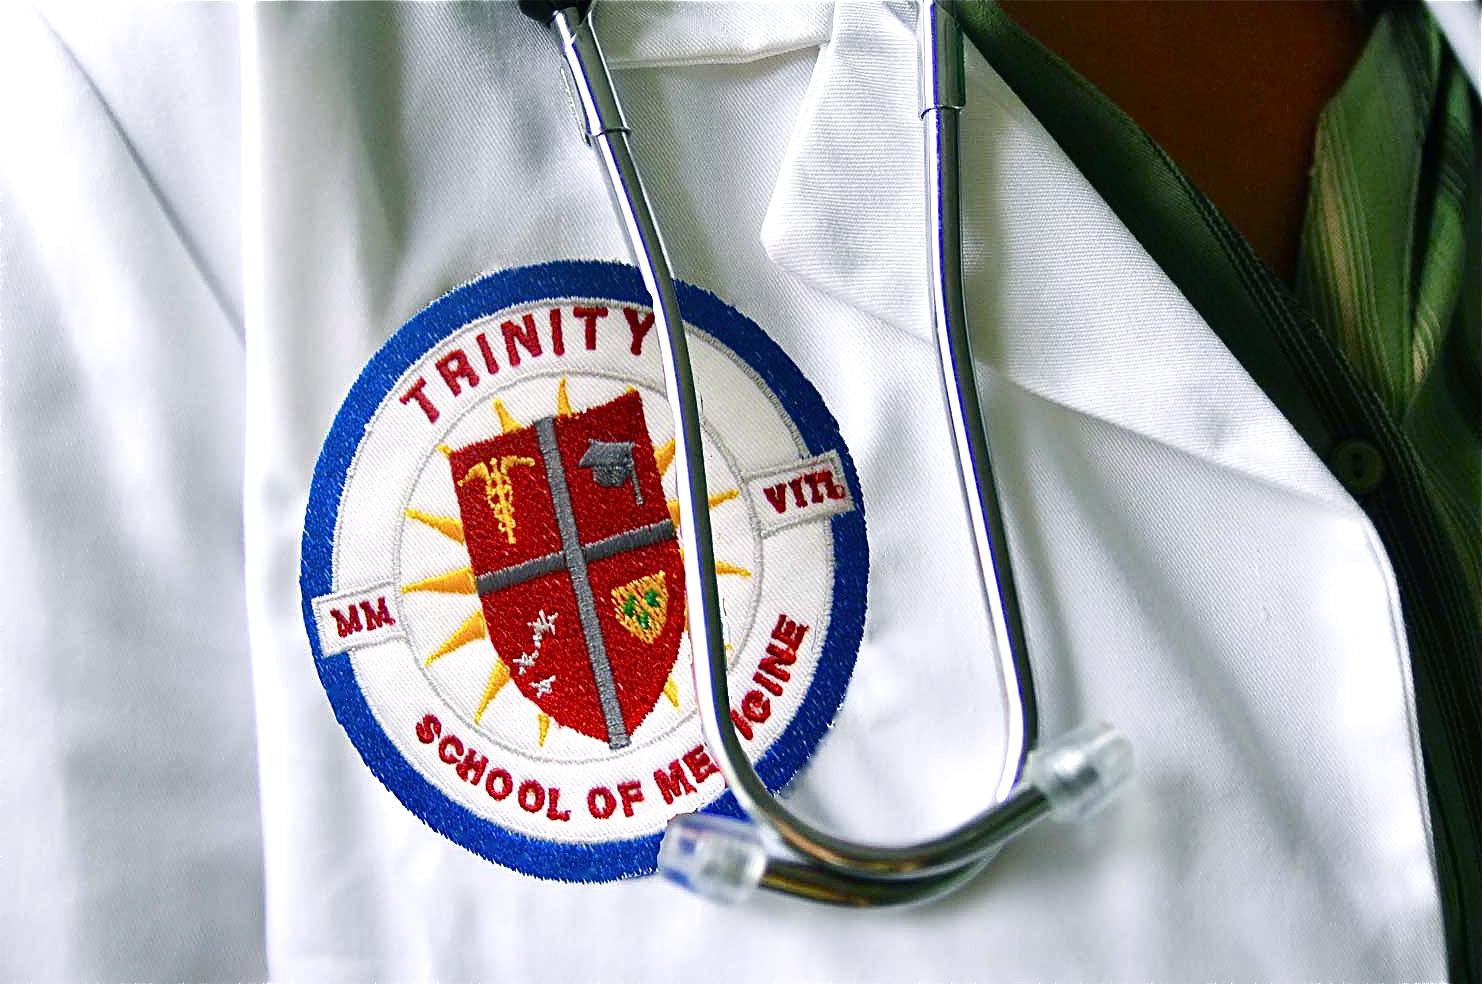 Trinity School of Medicine 2012 Residency Match Results